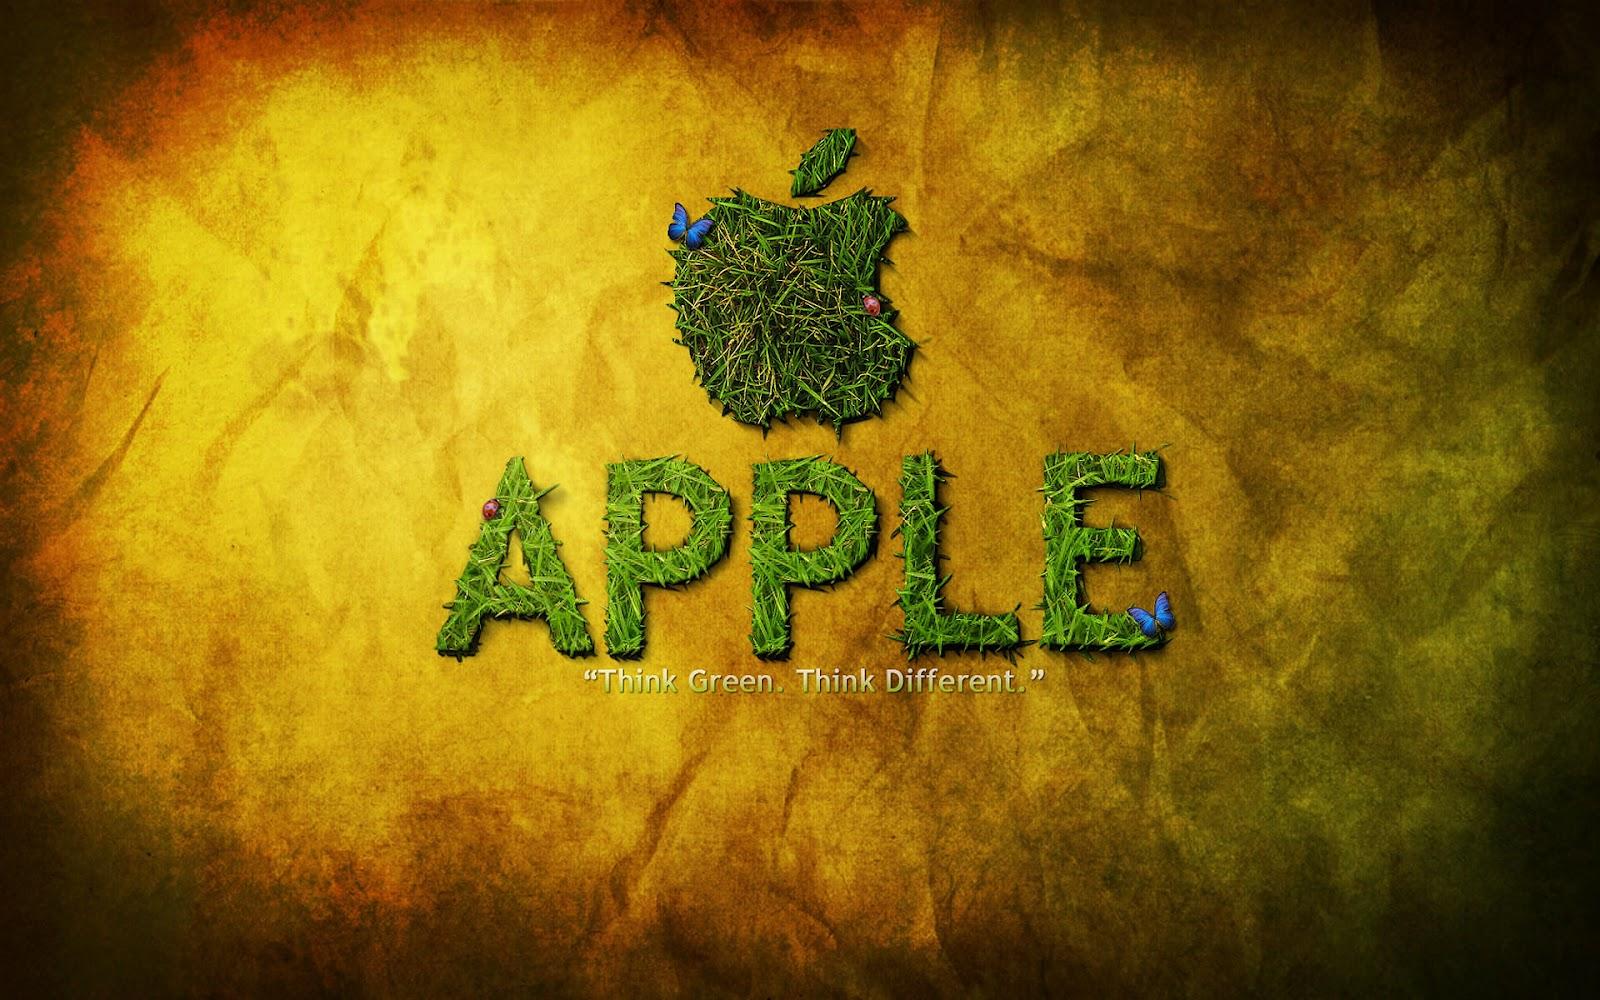 http://2.bp.blogspot.com/-ARL6_OT2iNM/UC9a5R1z9qI/AAAAAAAAAdM/1DXC_G-5chU/s1600/hd-gele-apple-wallpaper-met-logo-en-apple-tekst-van-gras-hd-apple-achtergrond.jpg